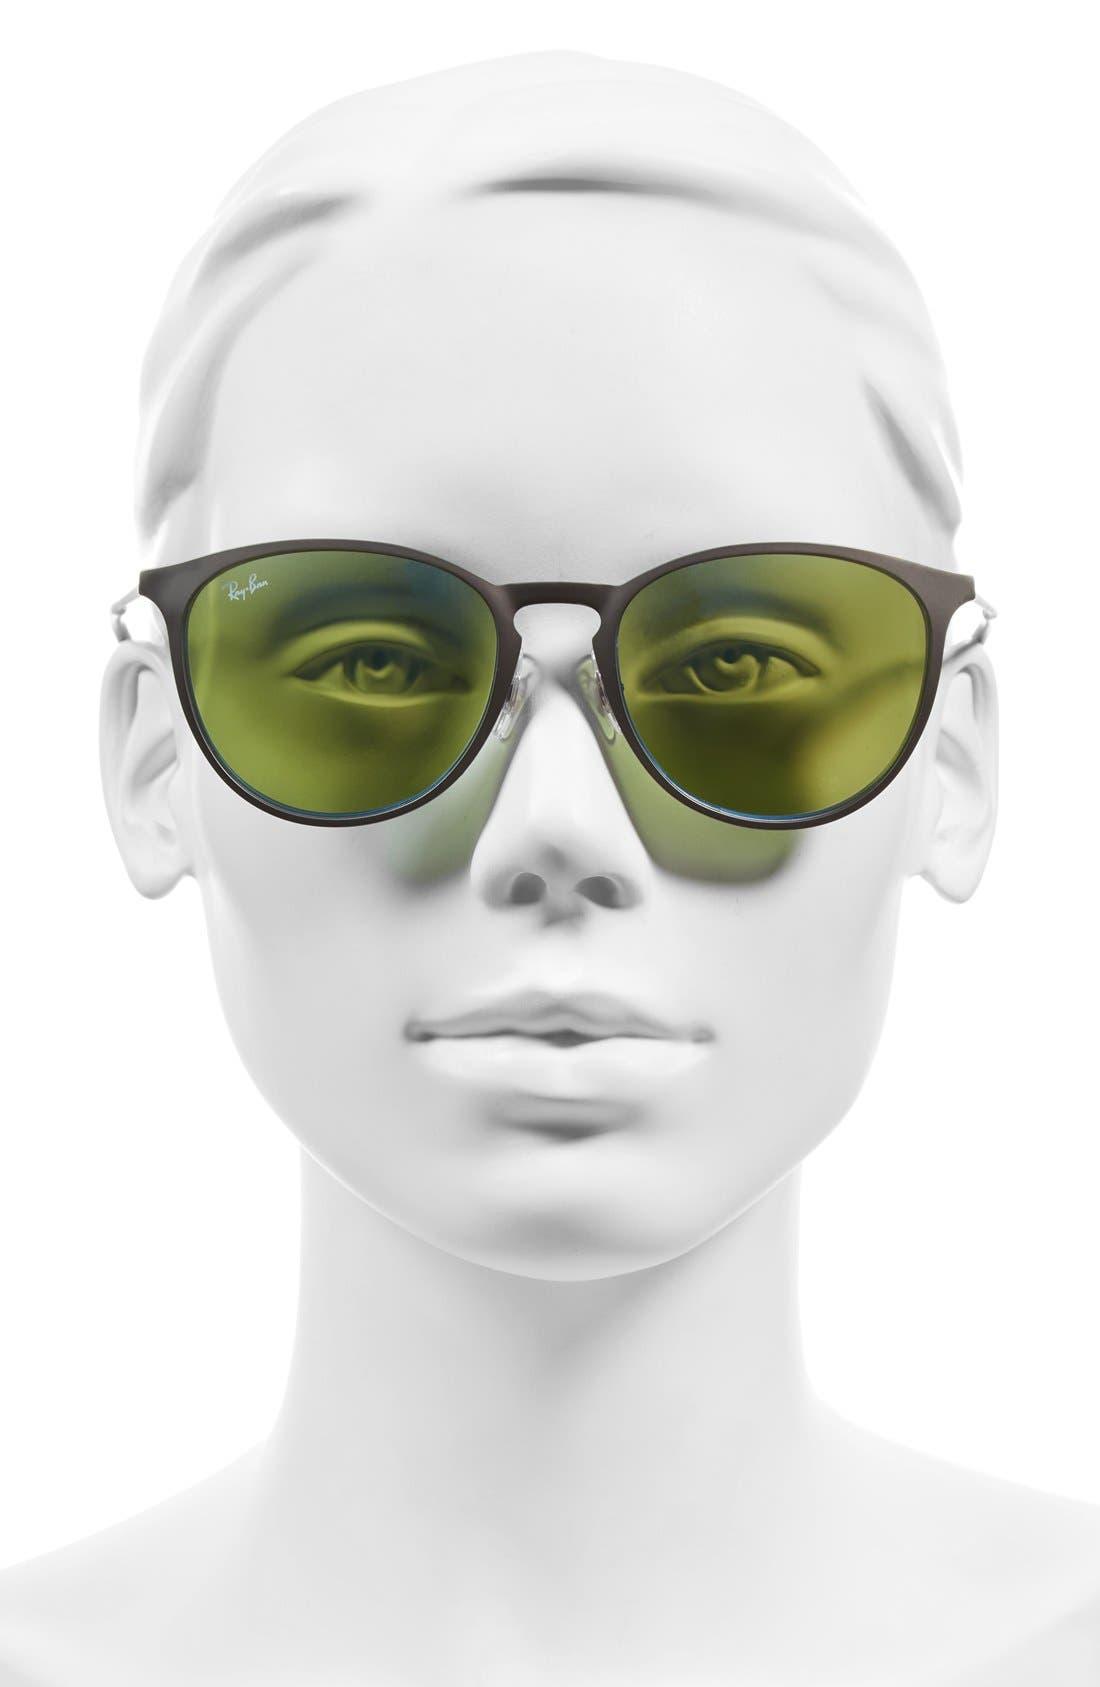 Highstreet 54mm Sunglasses,                             Alternate thumbnail 2, color,                             300